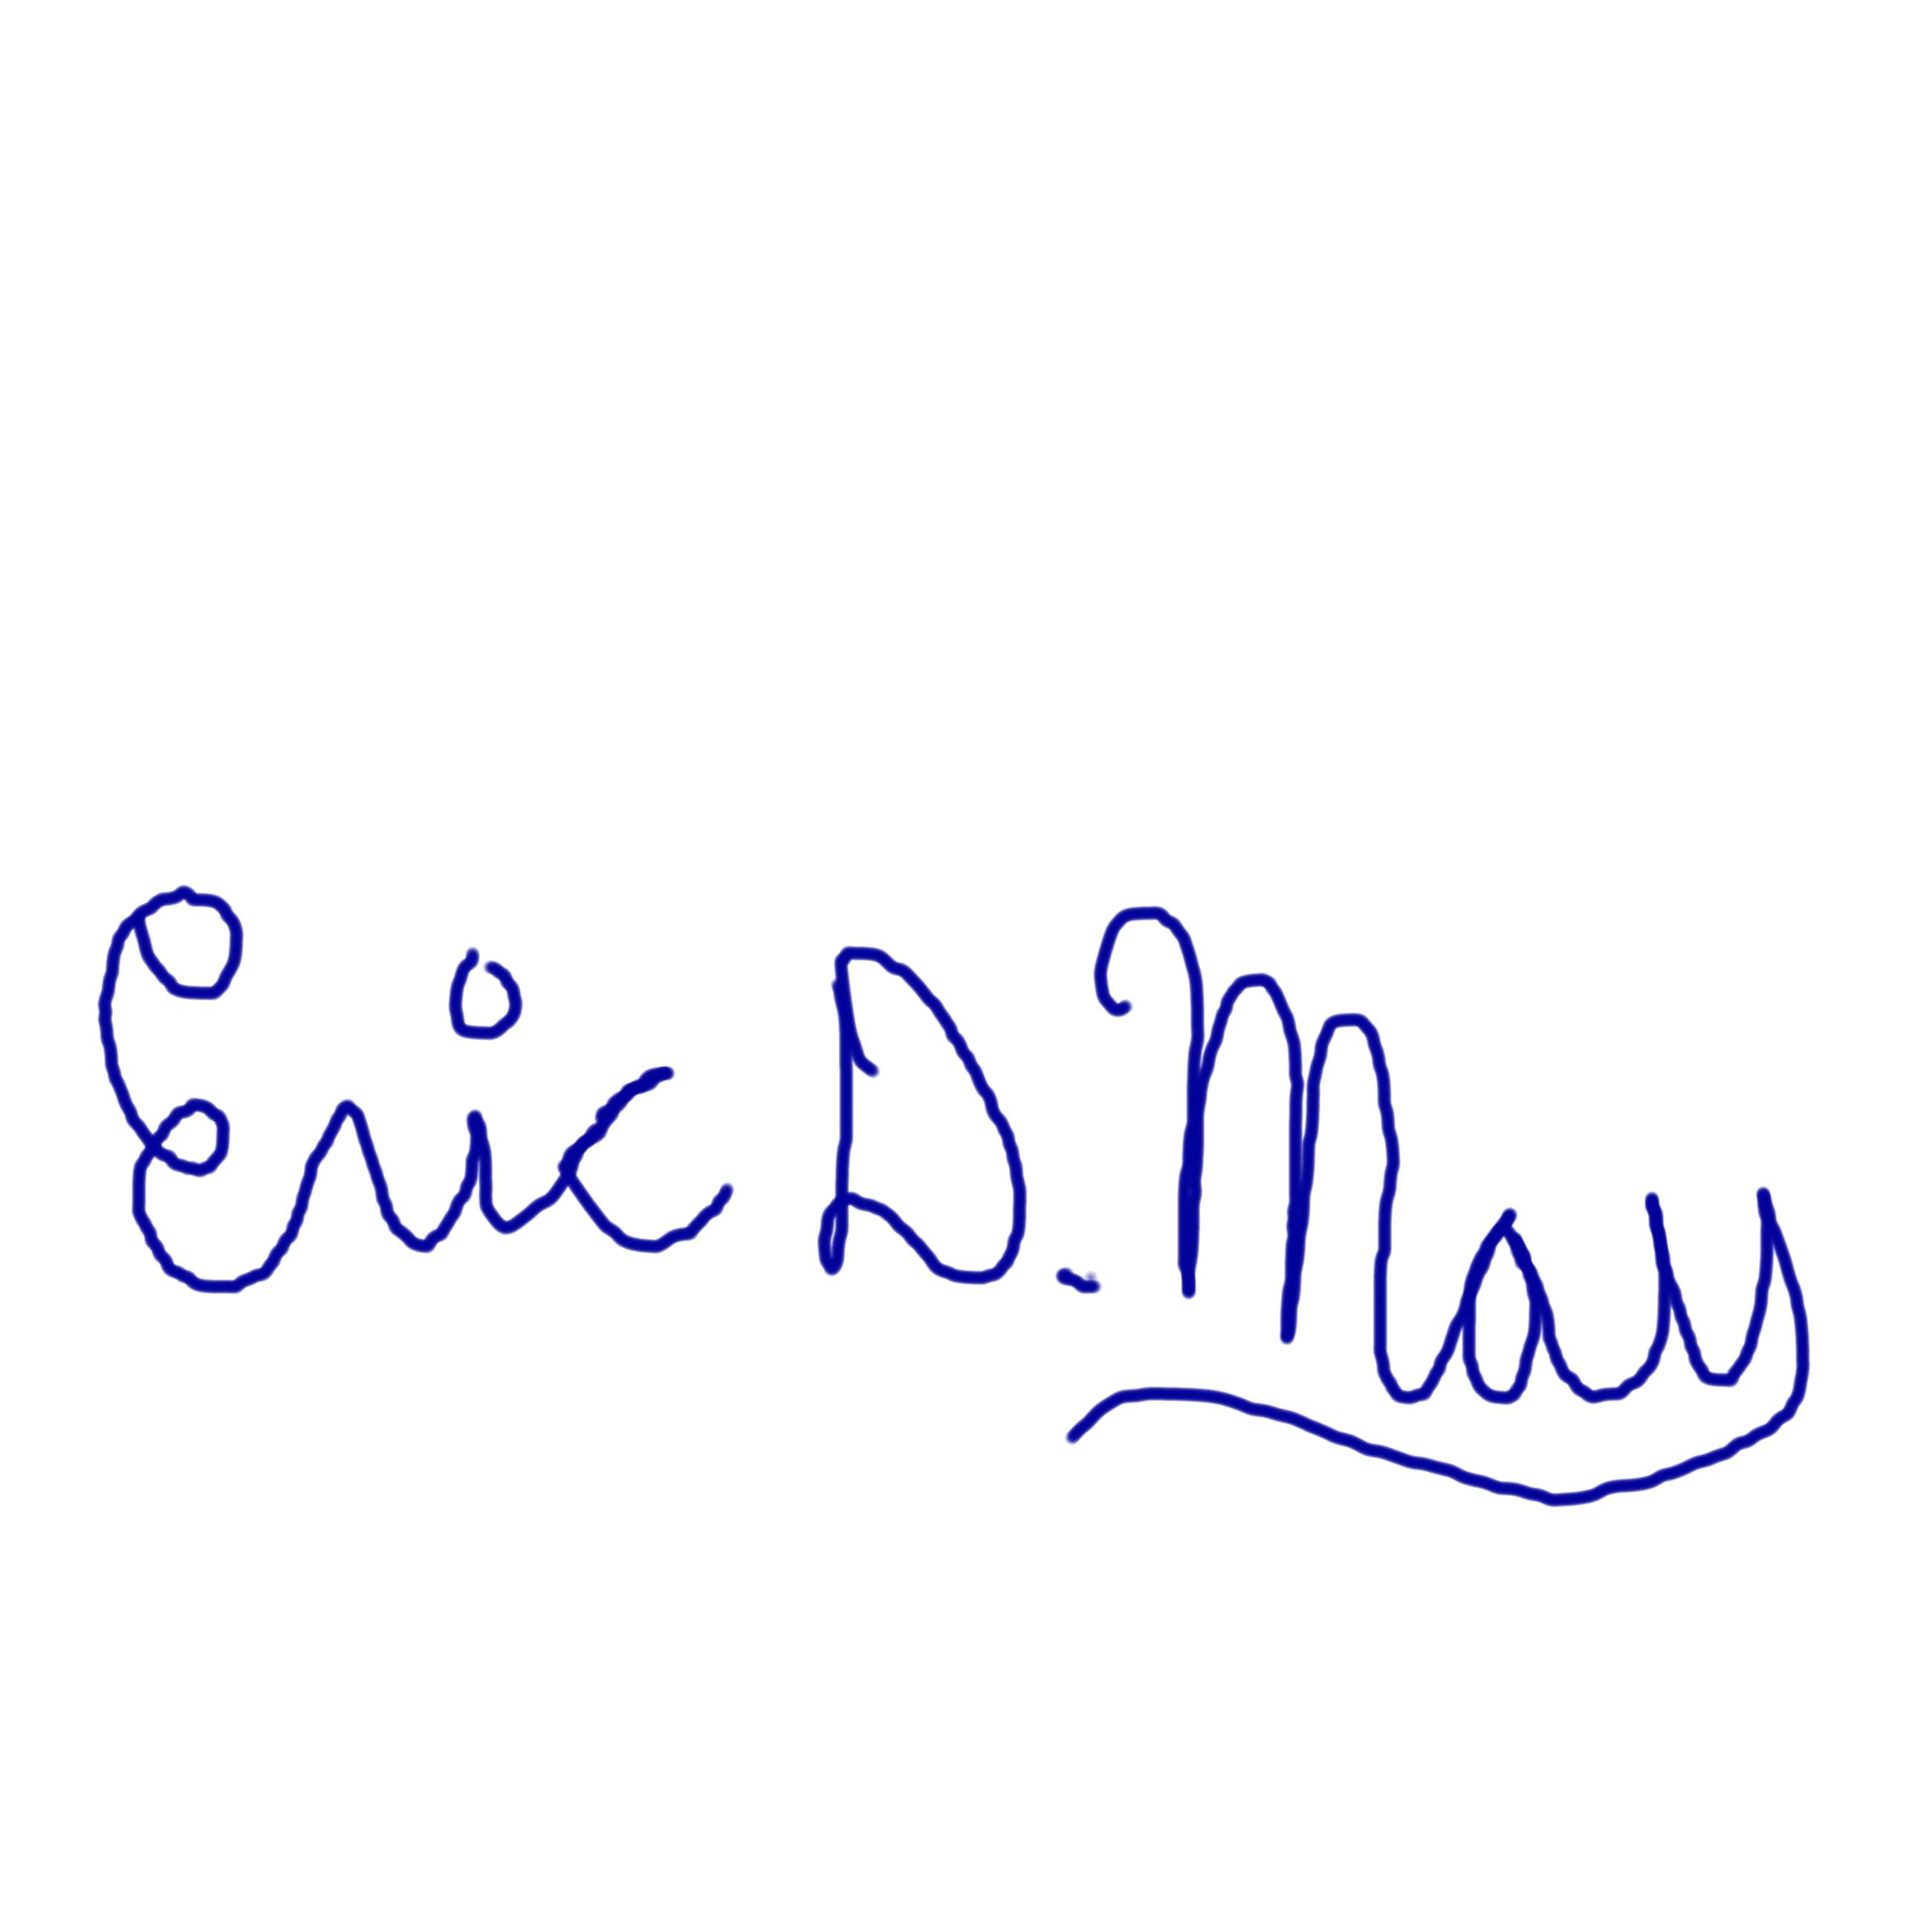 Eric May Signature